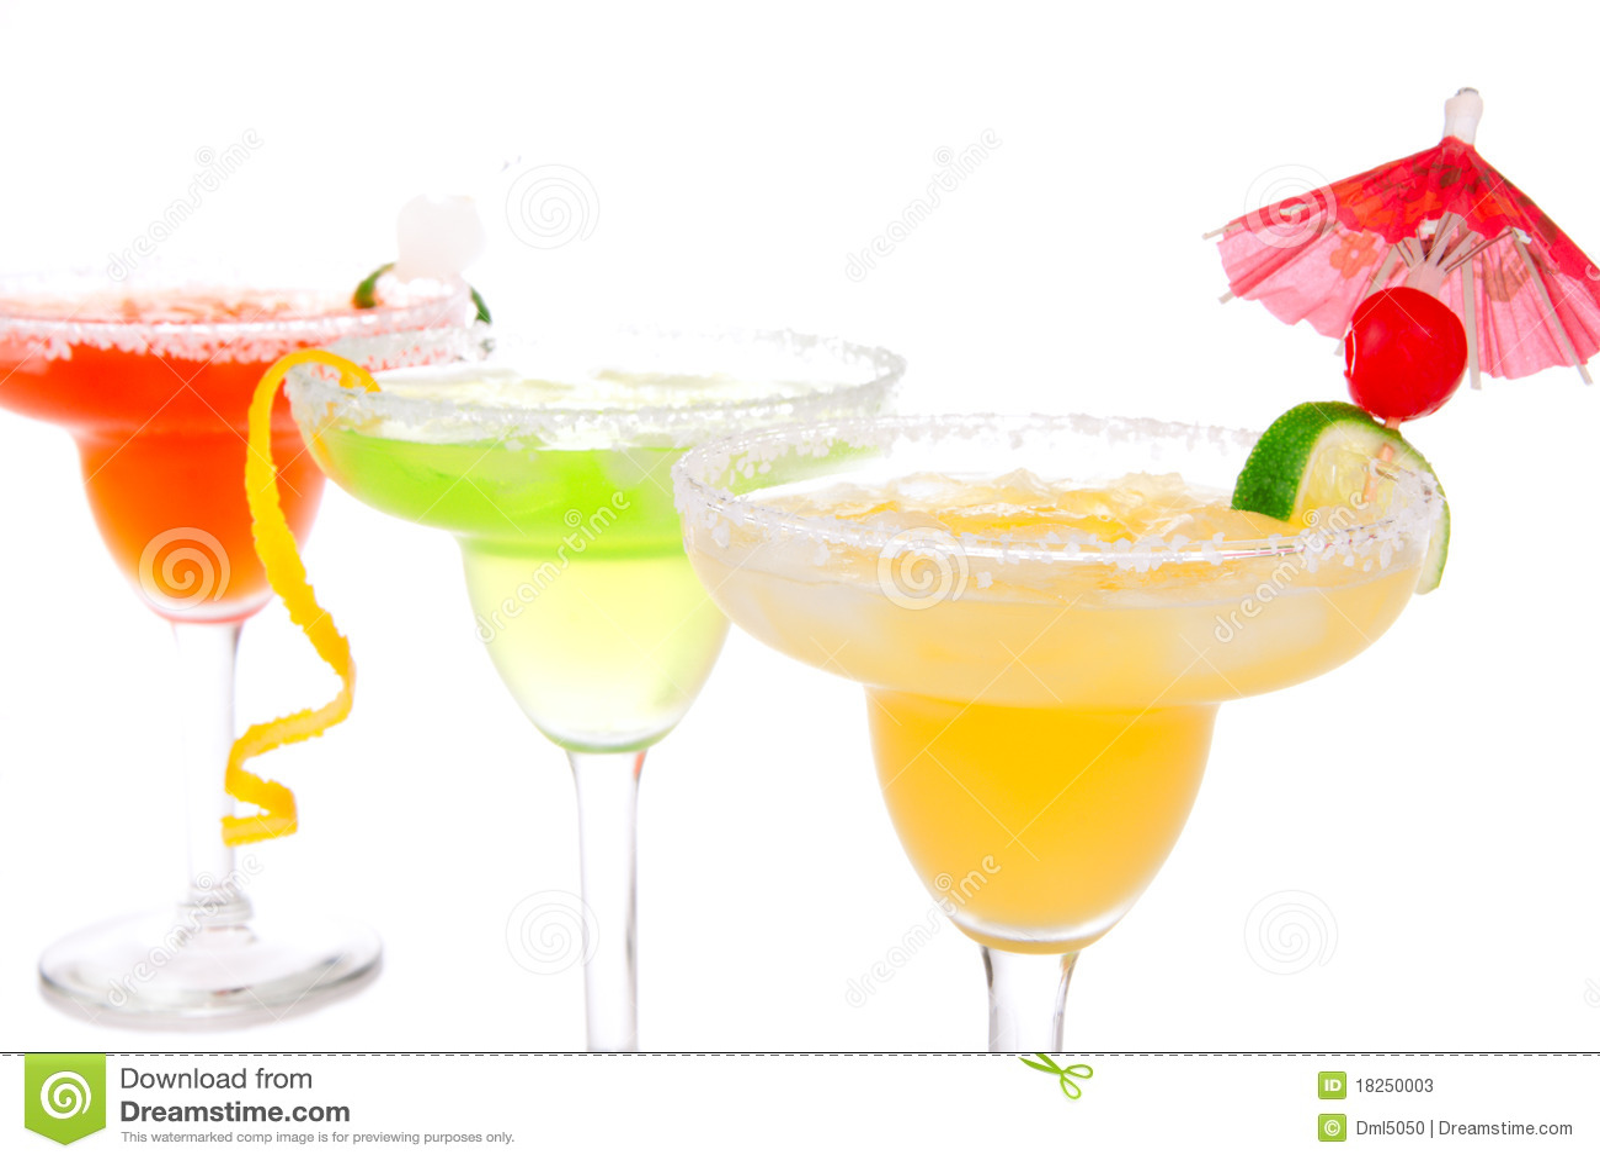 Lime, apple Margaritas cocktails composition